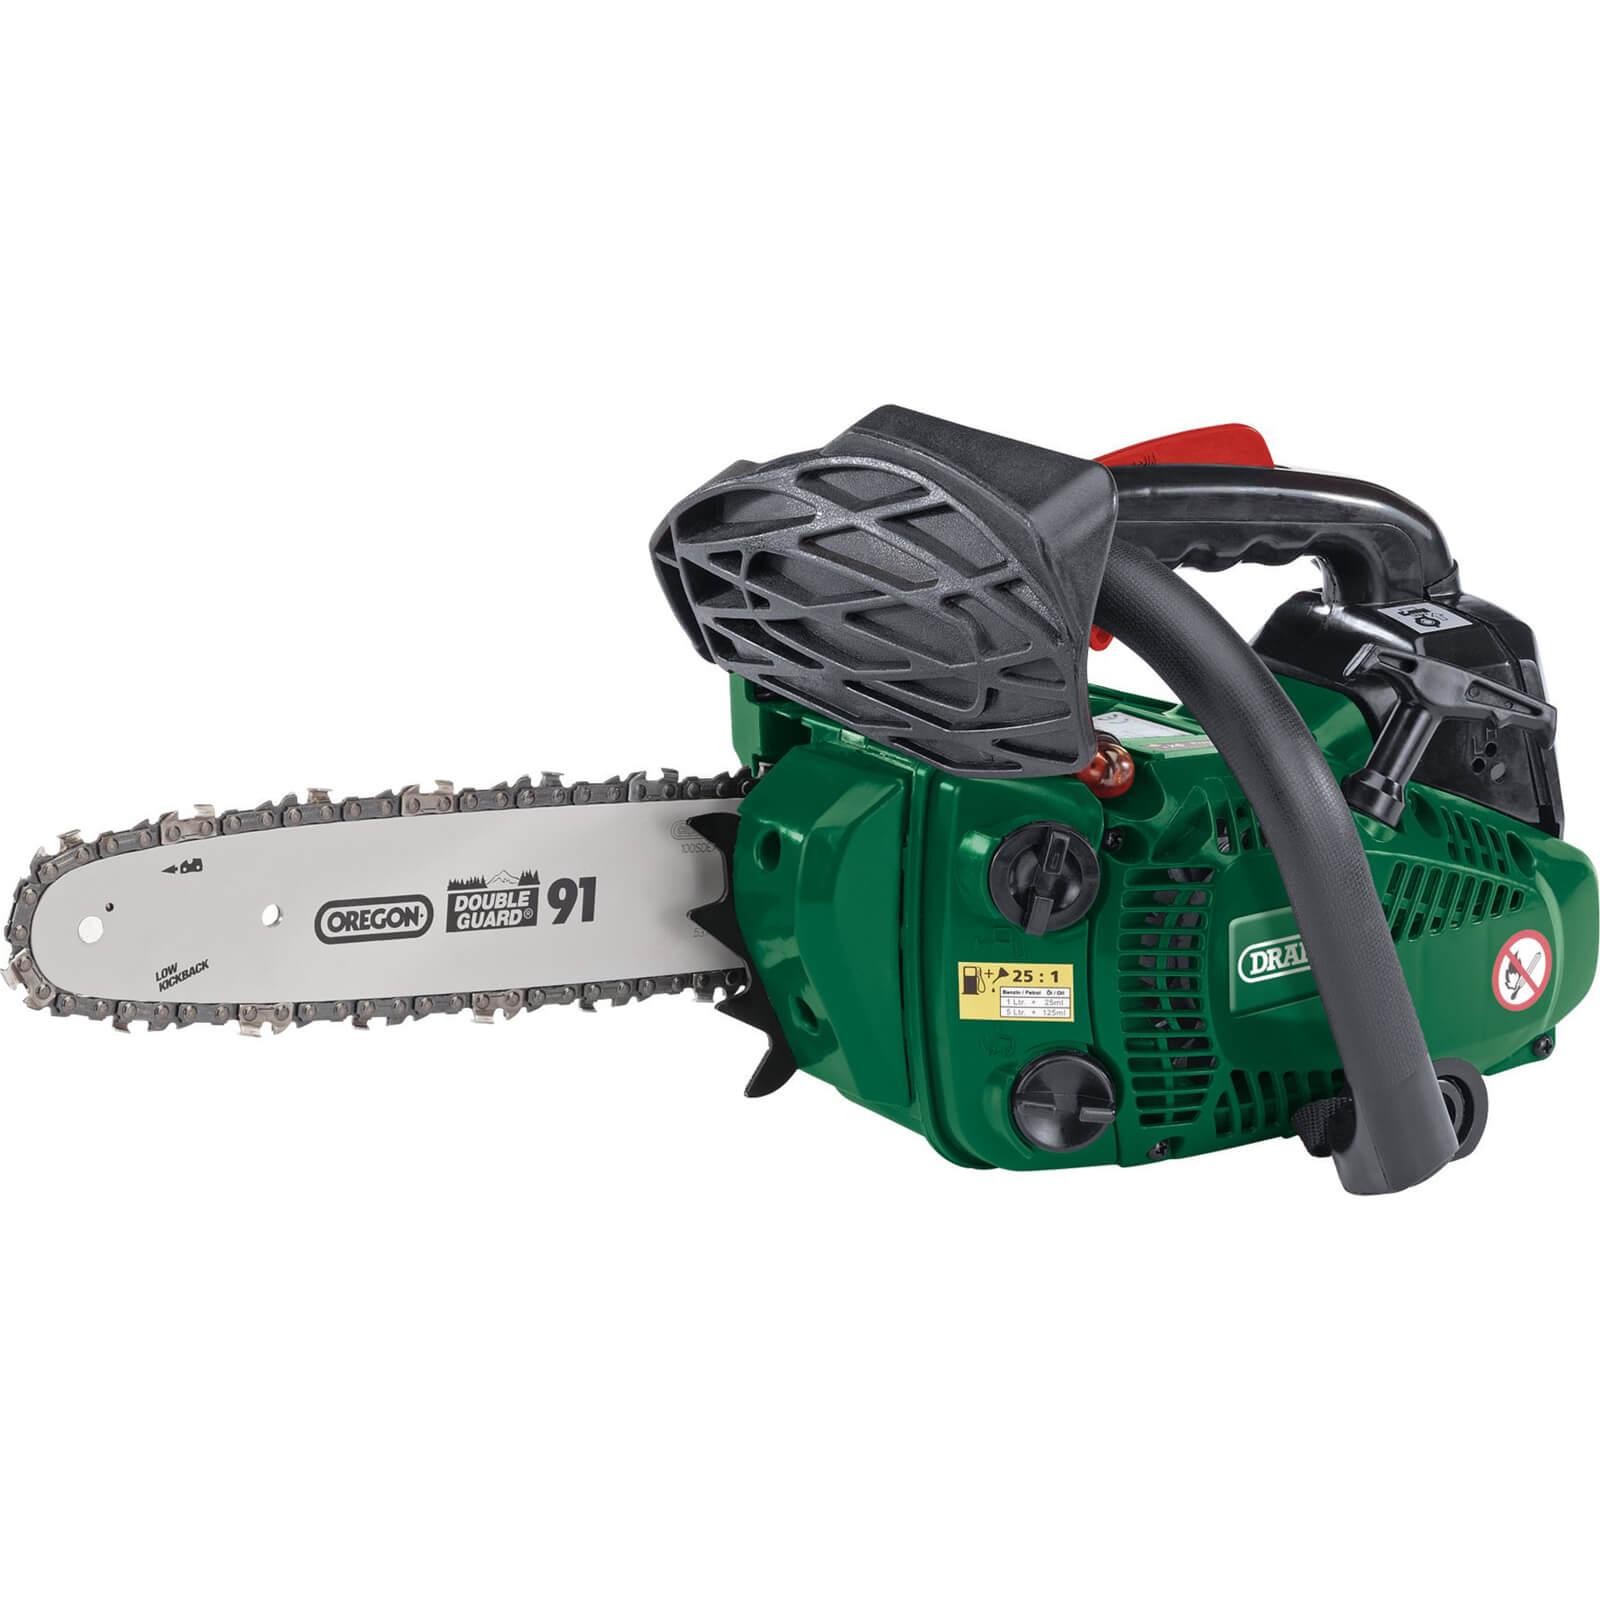 Draper CSP2625 Petrol Chainsaw 250mm